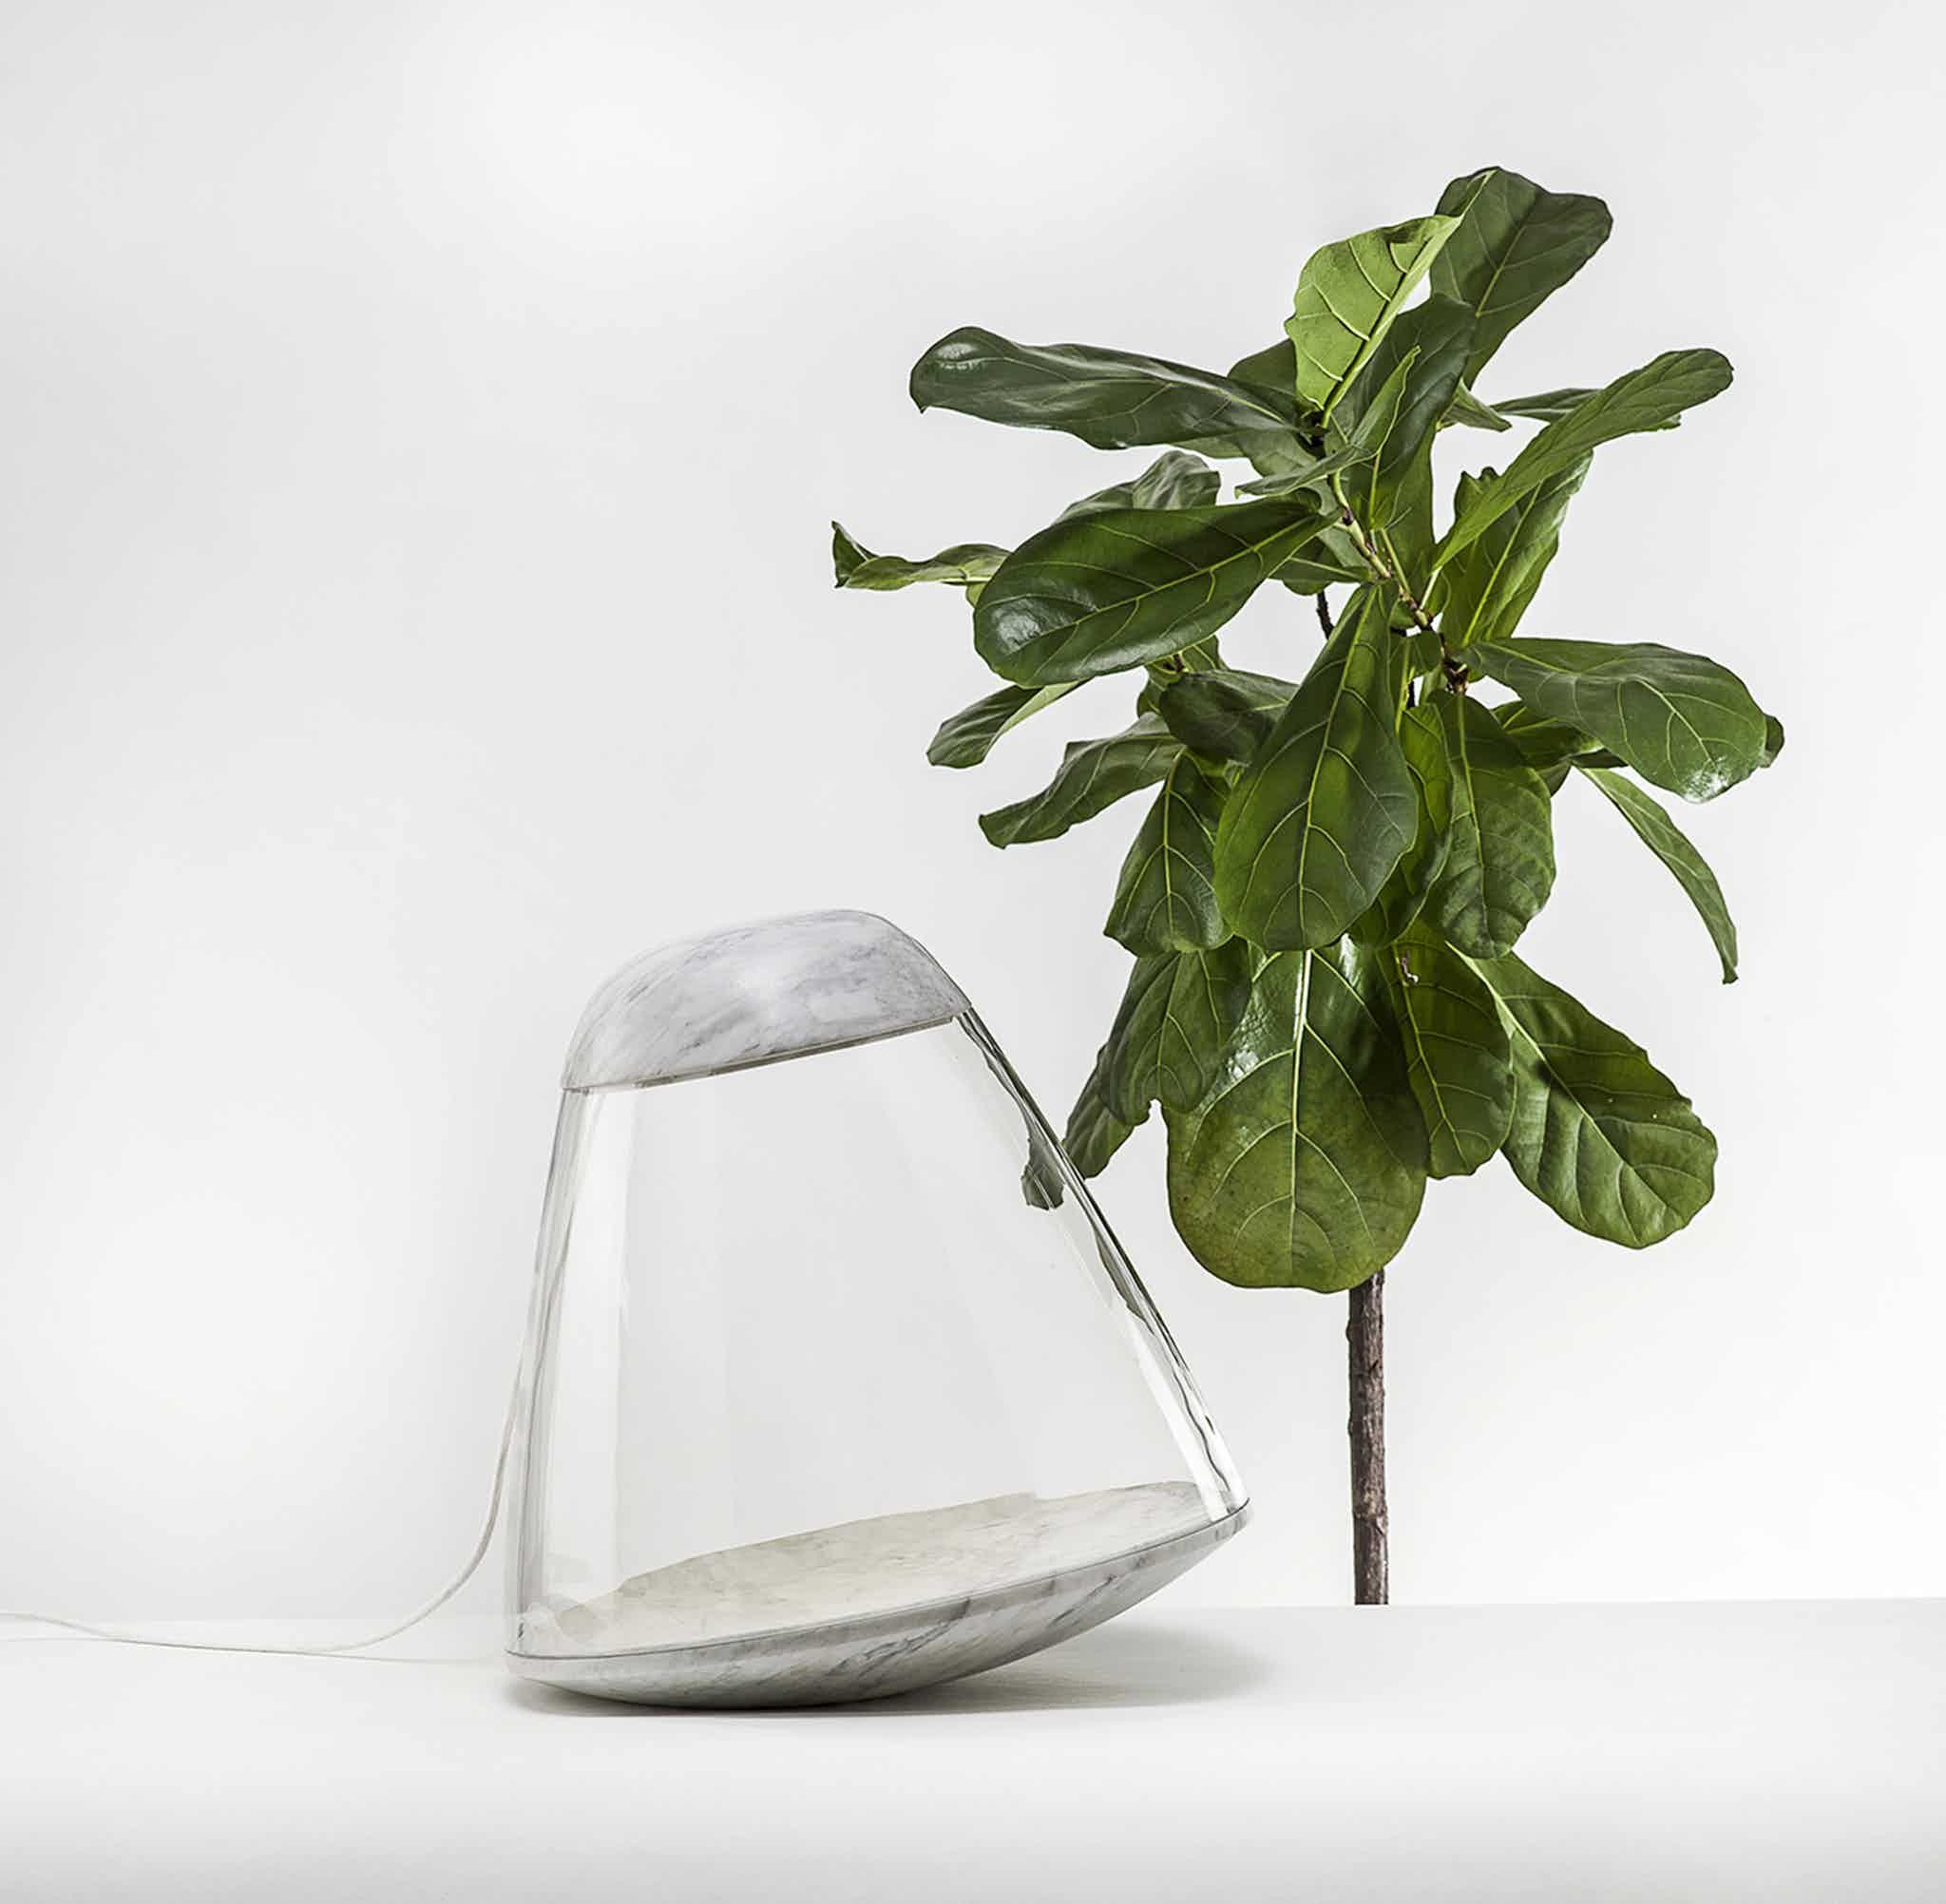 La-chance-furniture-apollo-floor-lamp-plant-haute-living